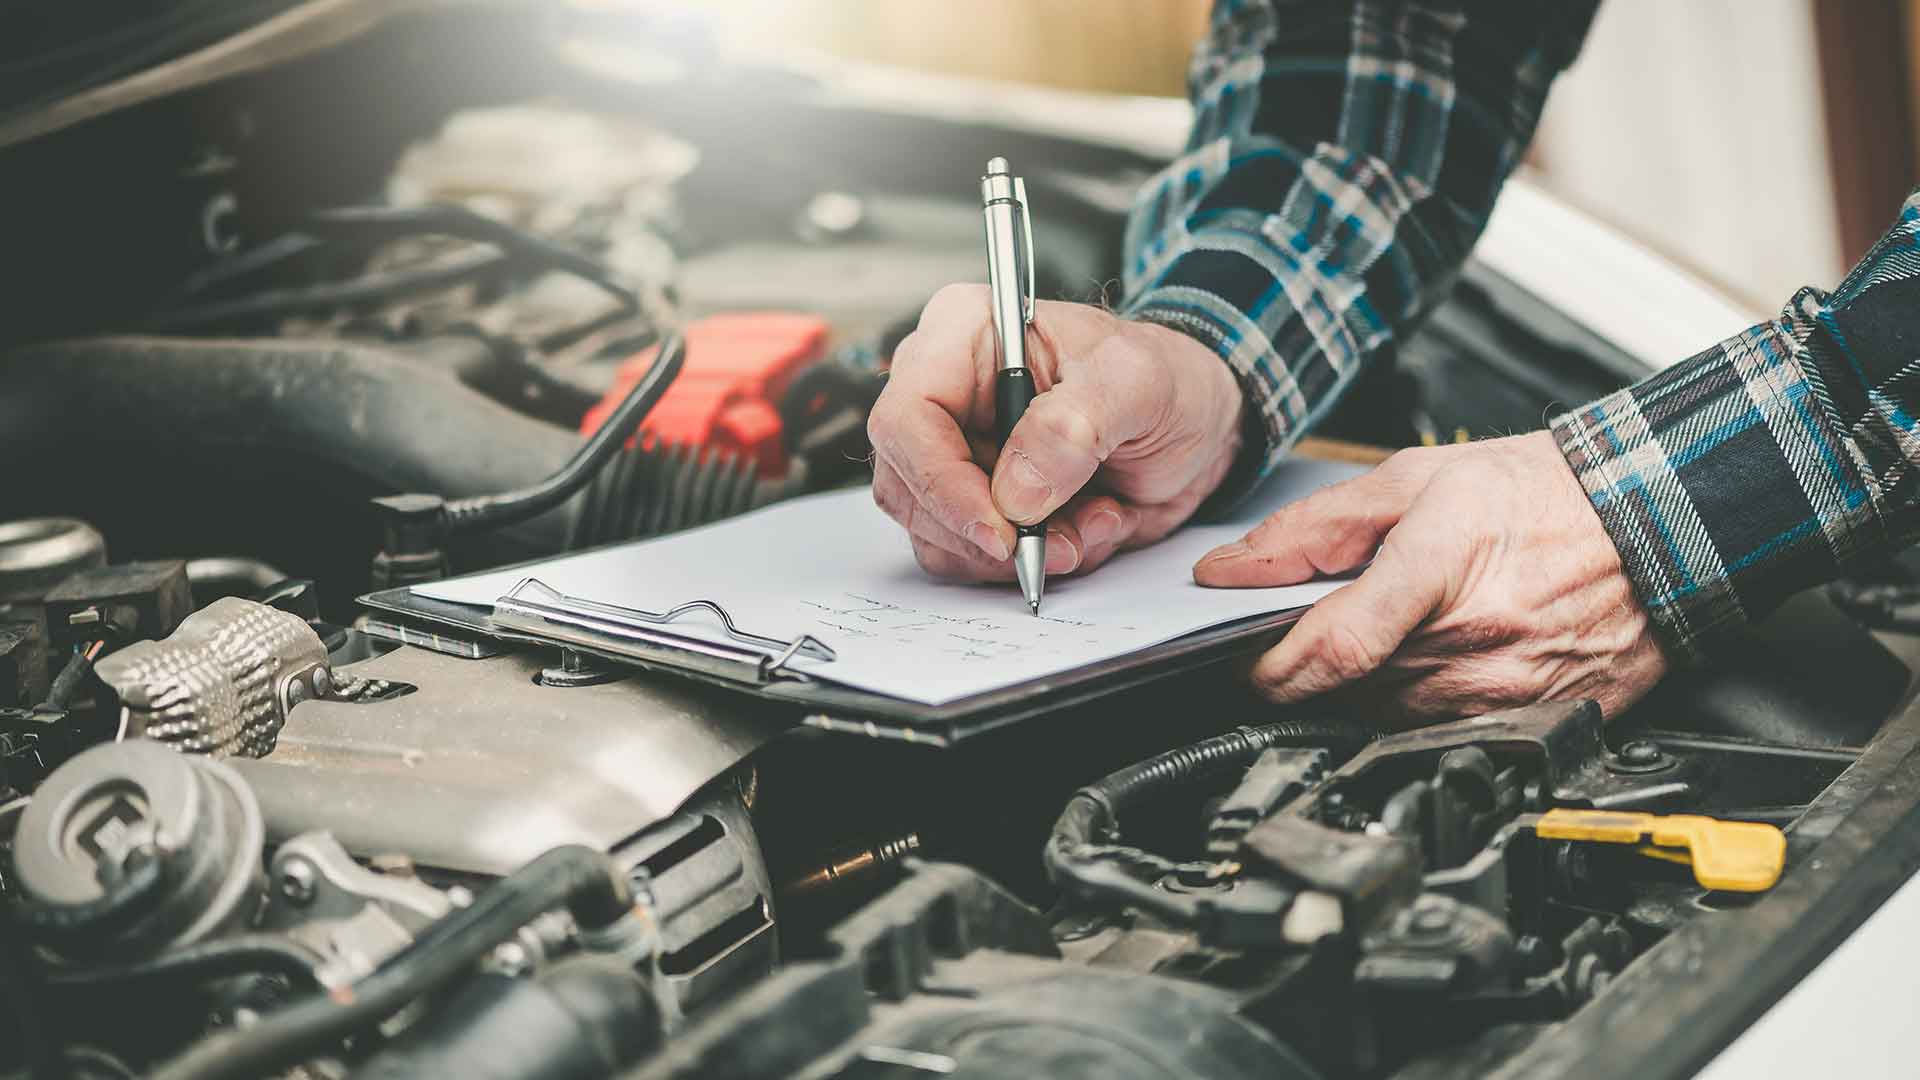 Mechaniker bei der UVV Fahrzeugprüfung